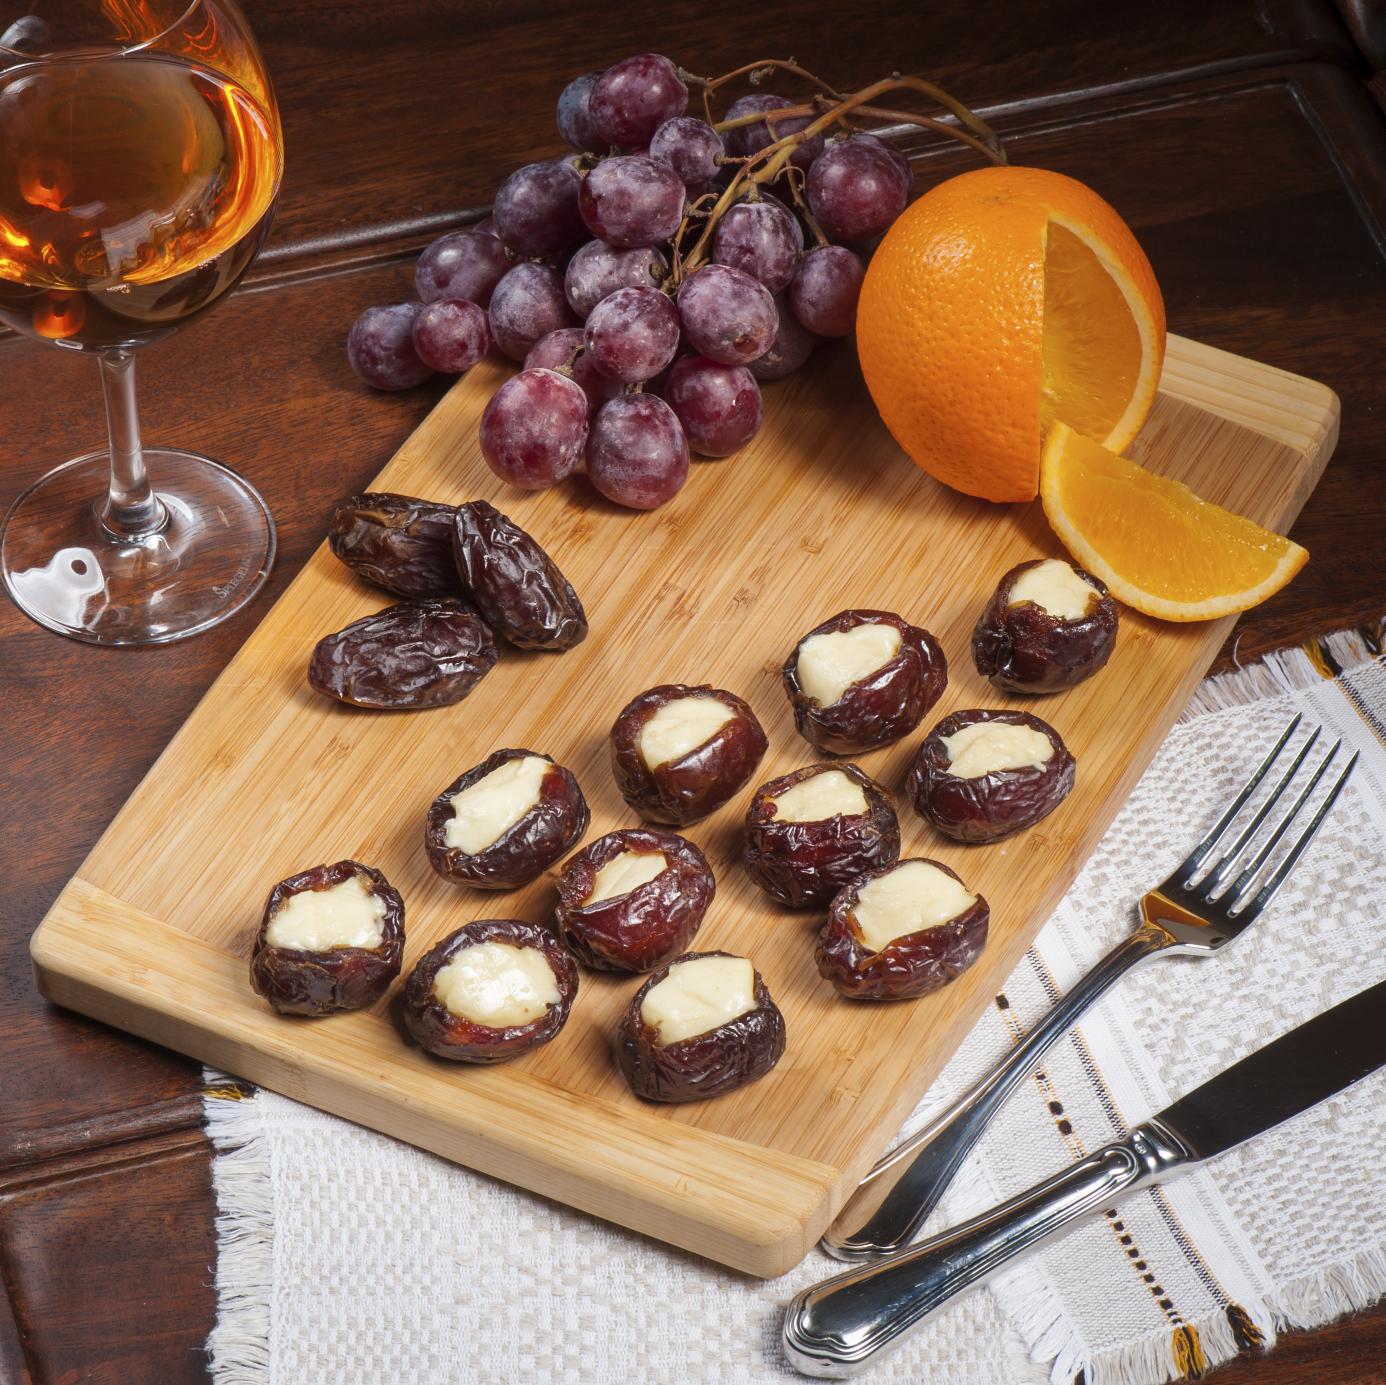 Stuffed dates with ricotta